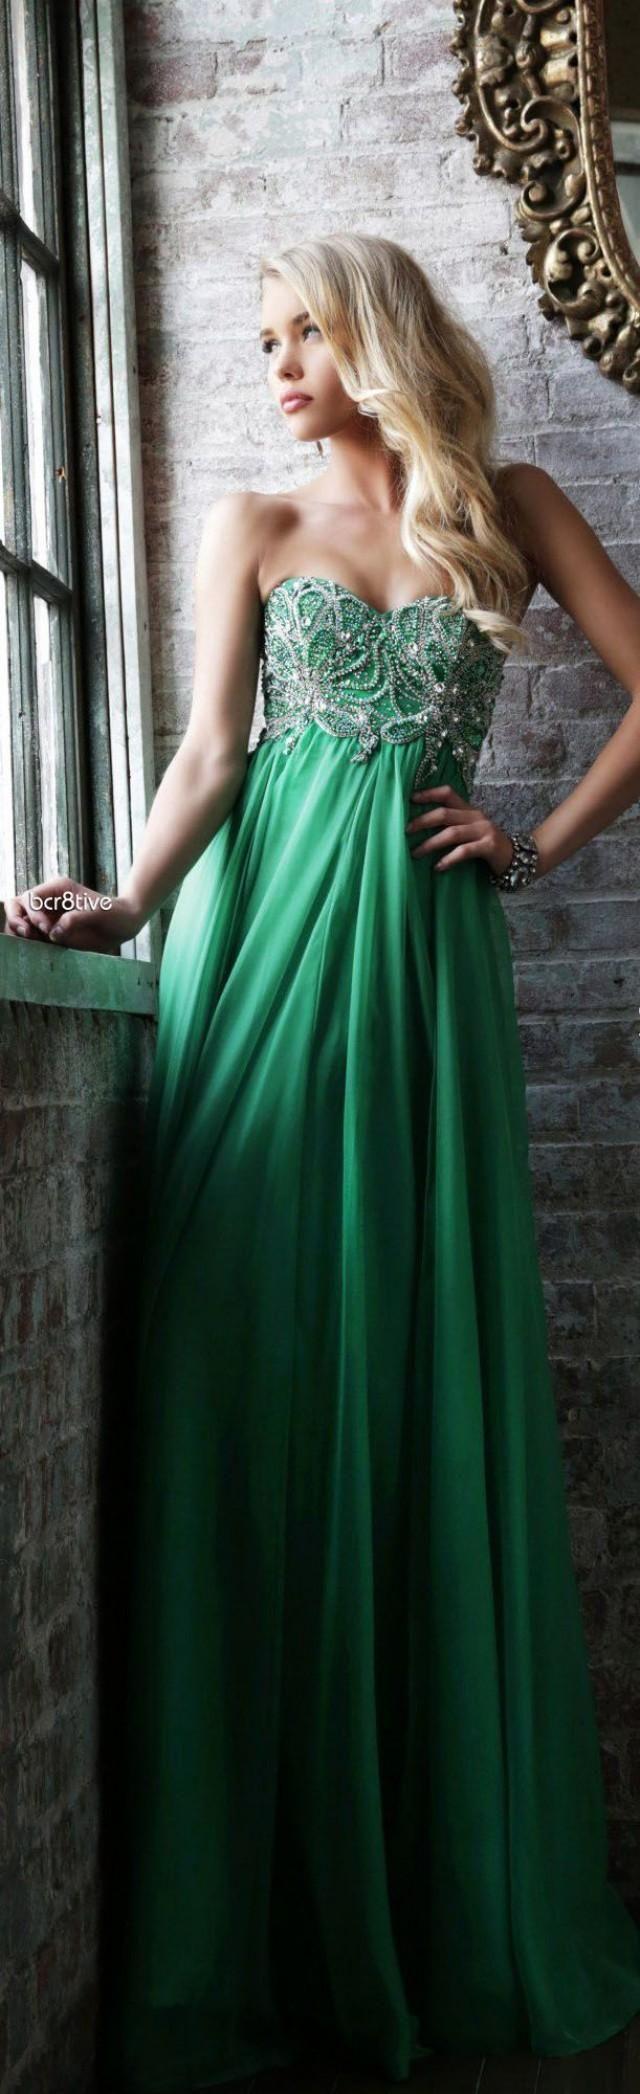 Sherri Hill 3907 green